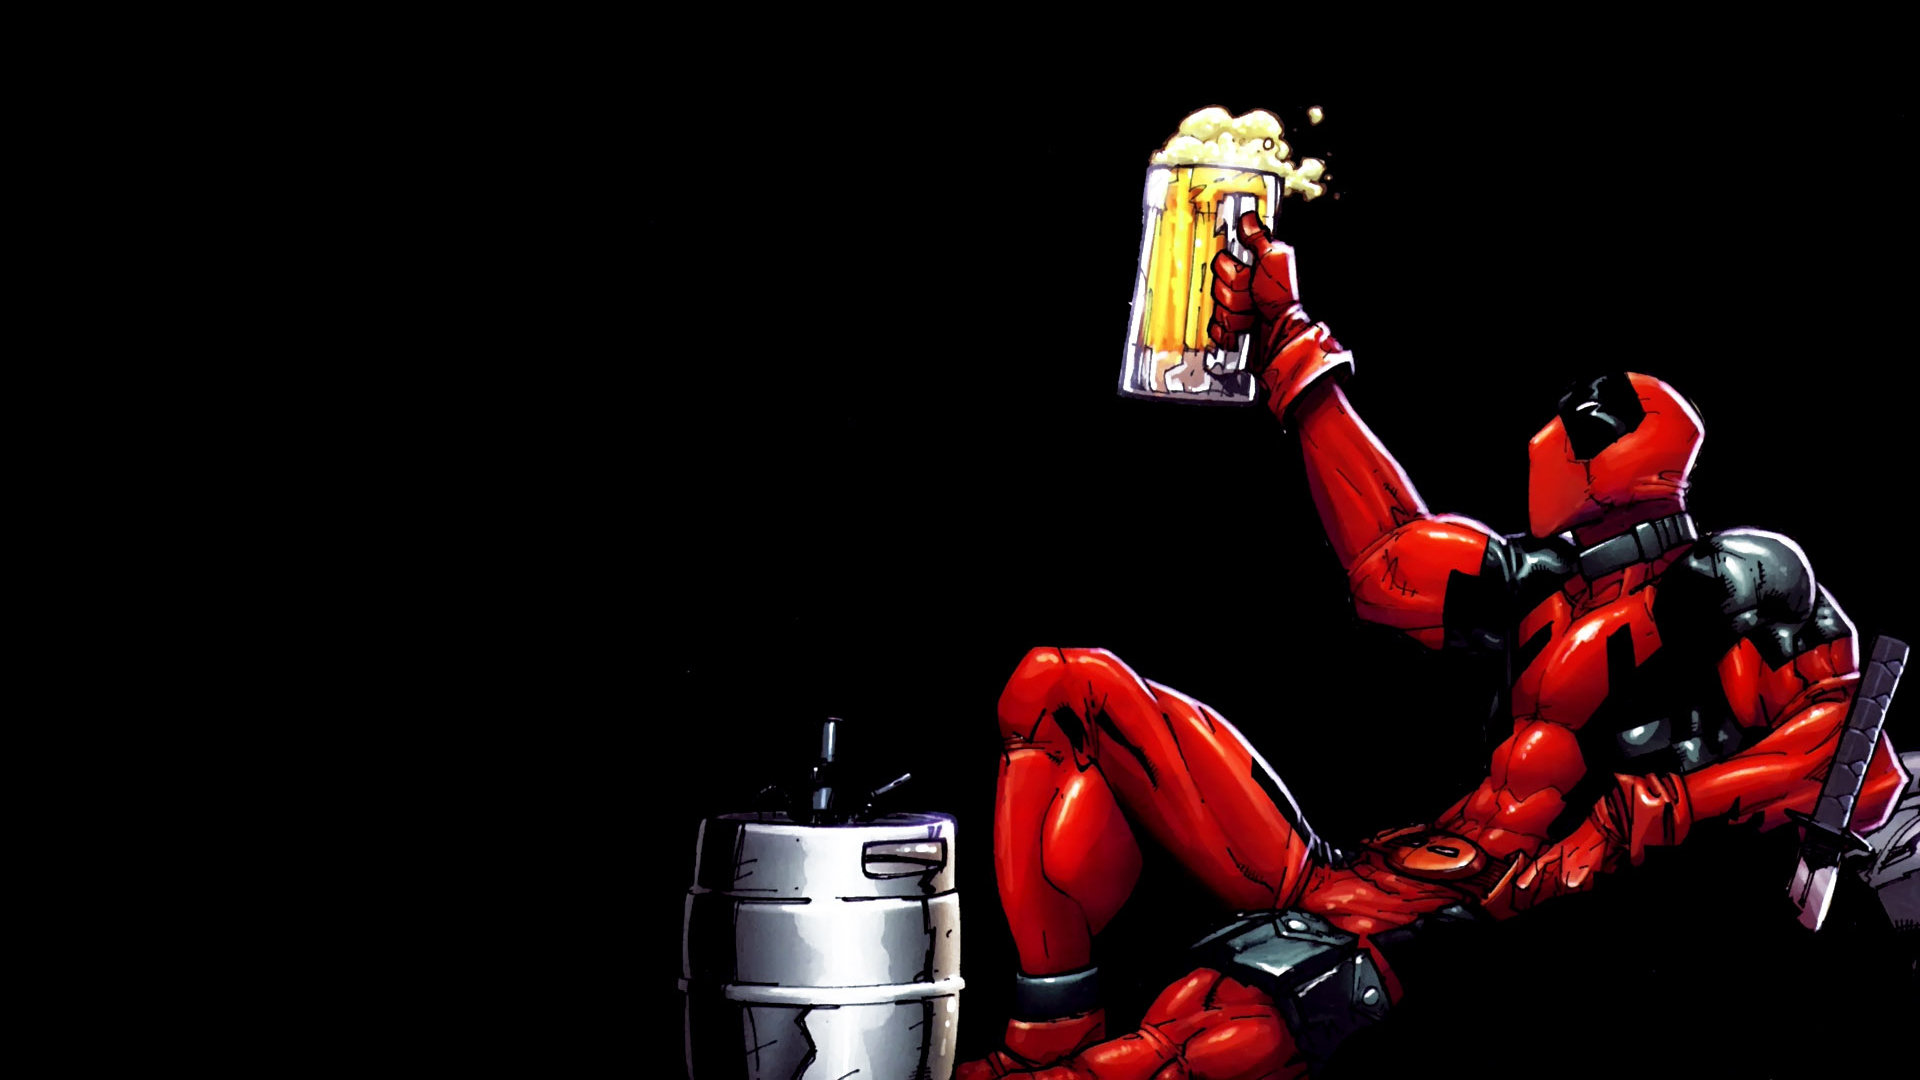 Download Funny Deadpool Wallpaper High Definition HD Games Wallpaper 1920x1080